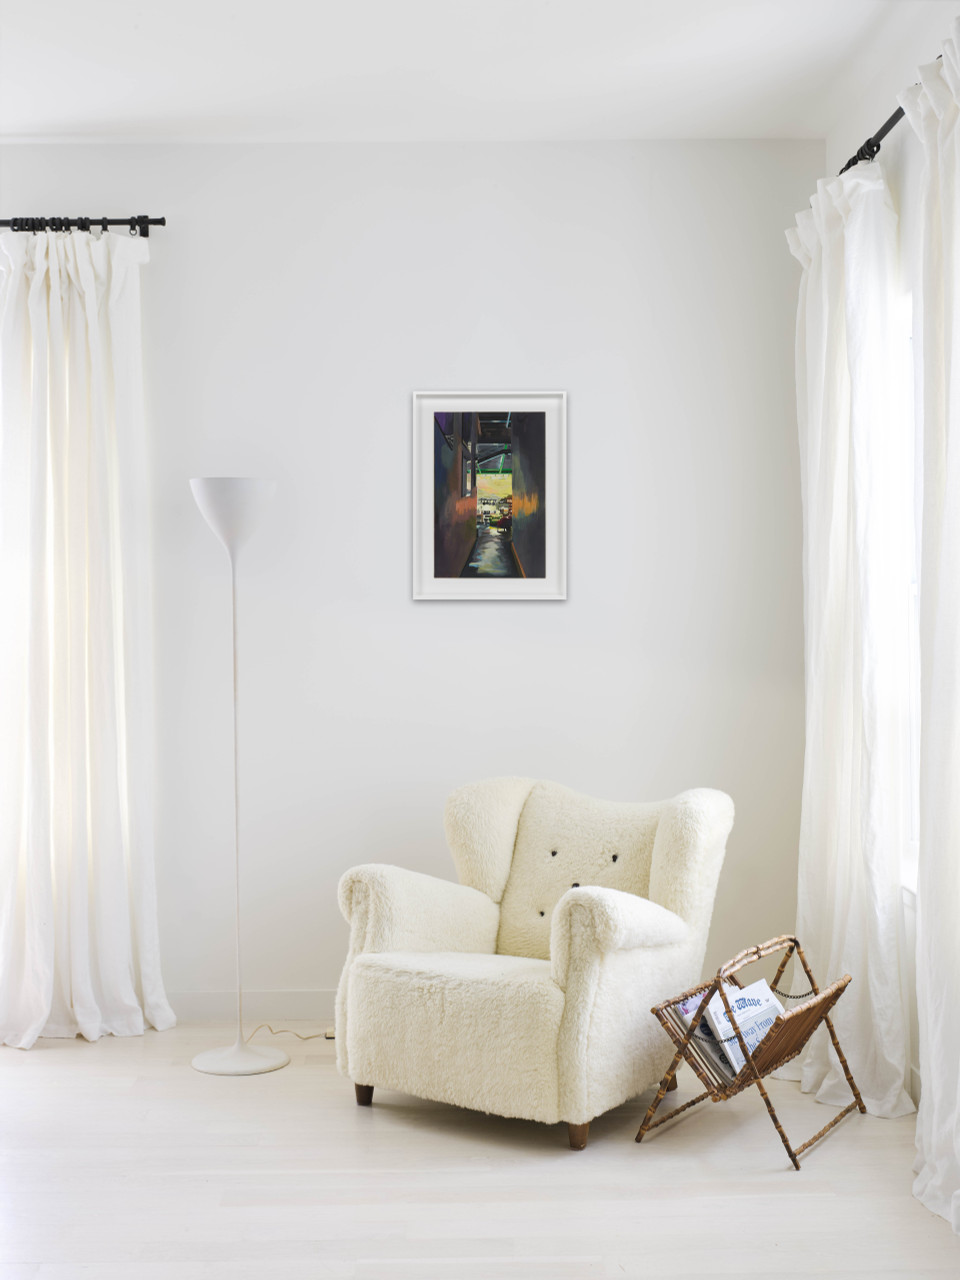 charles mayton 20201113 interior